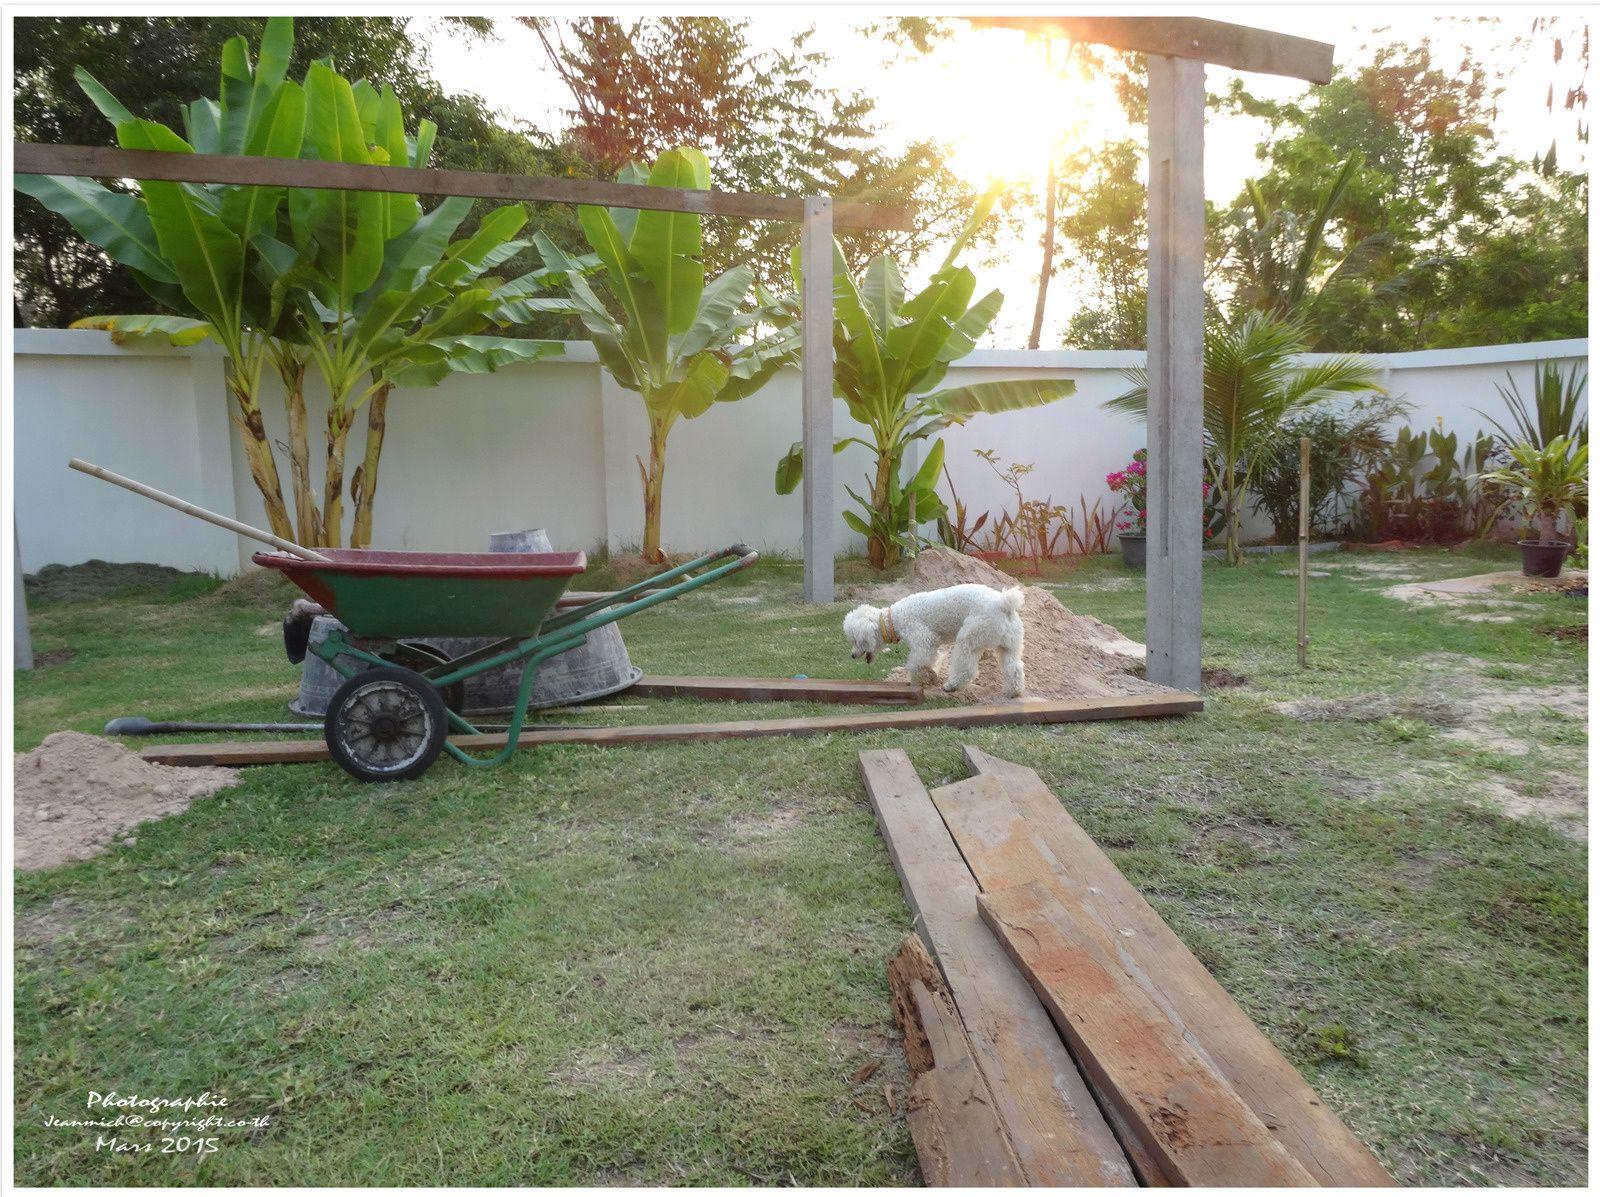 Construction d'un abri de jardin (sala en Thaï)